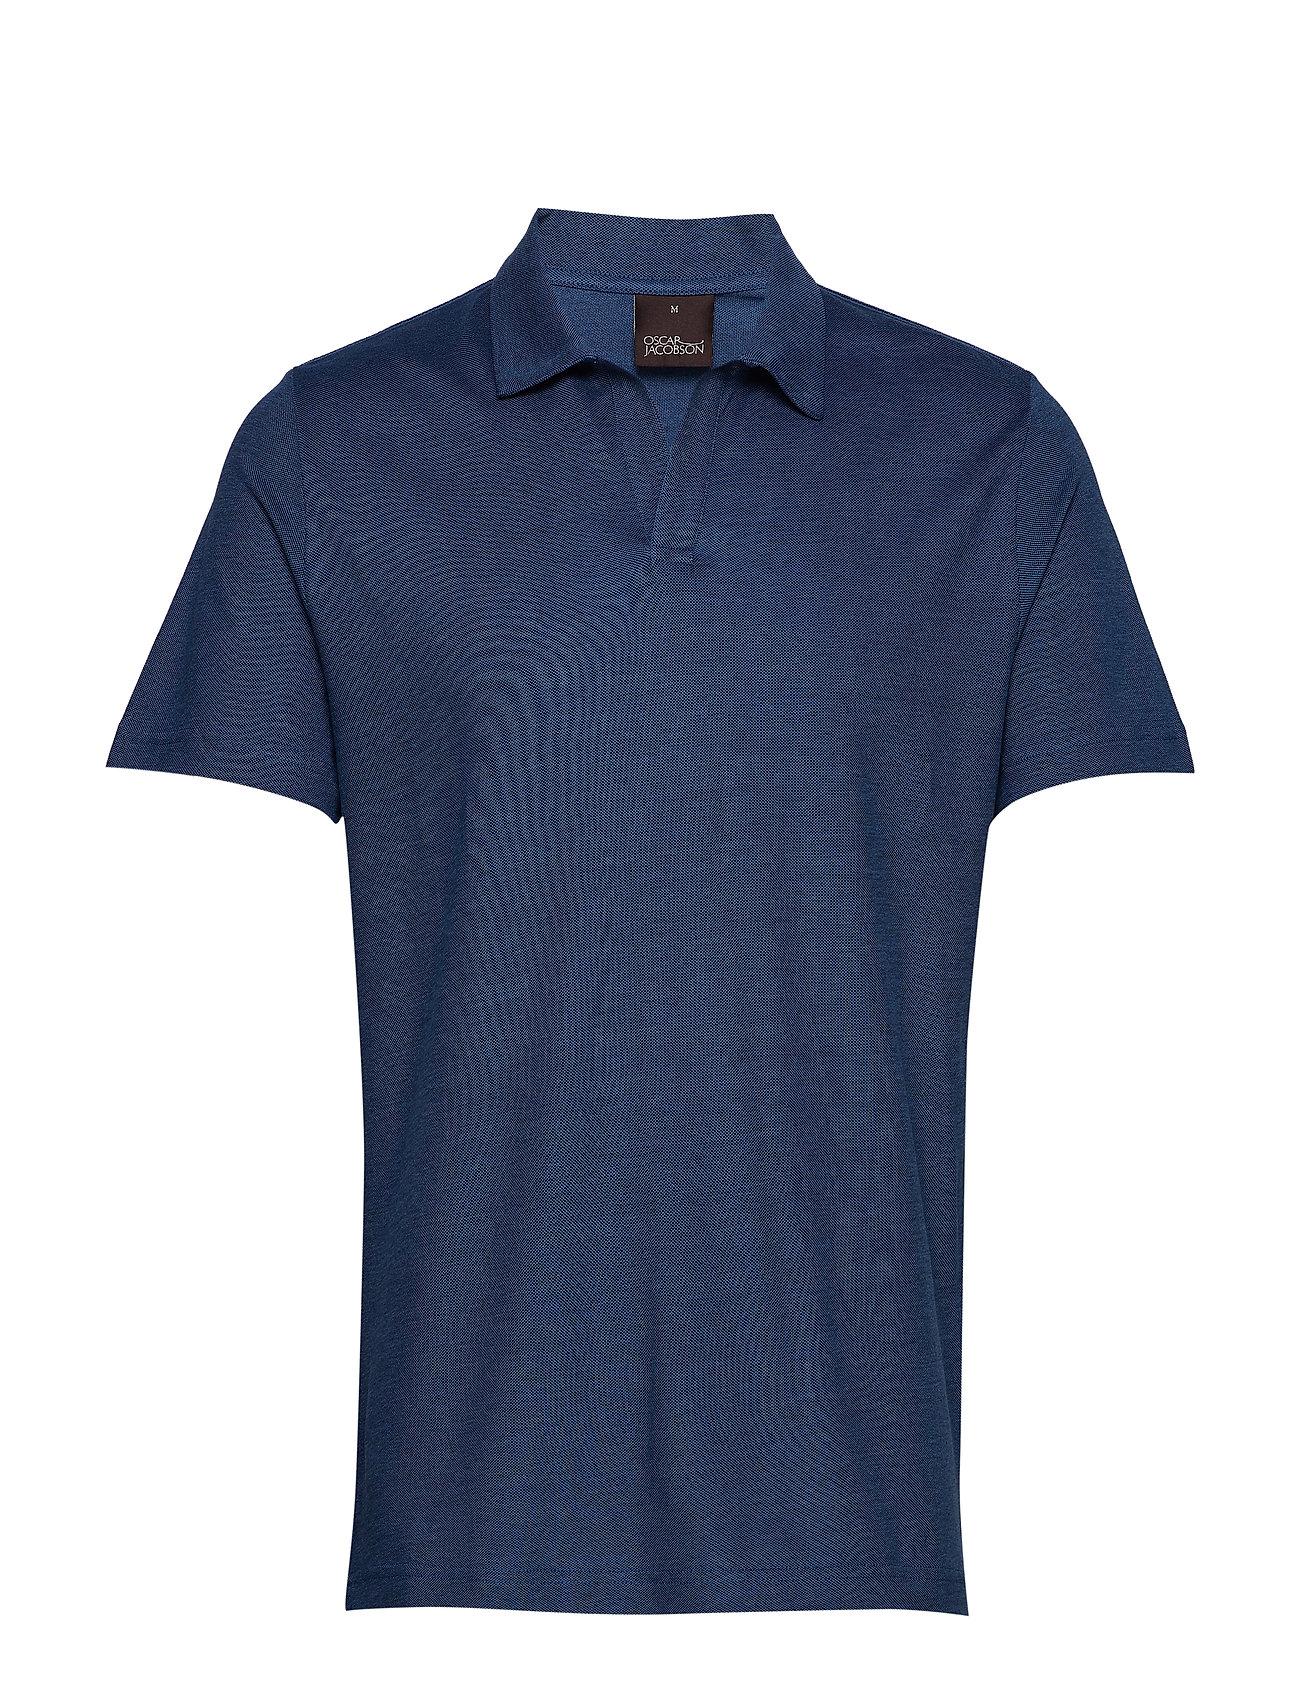 Jacobson Barrey S Barrey Poloshirt sOscar 8v0nmNwO